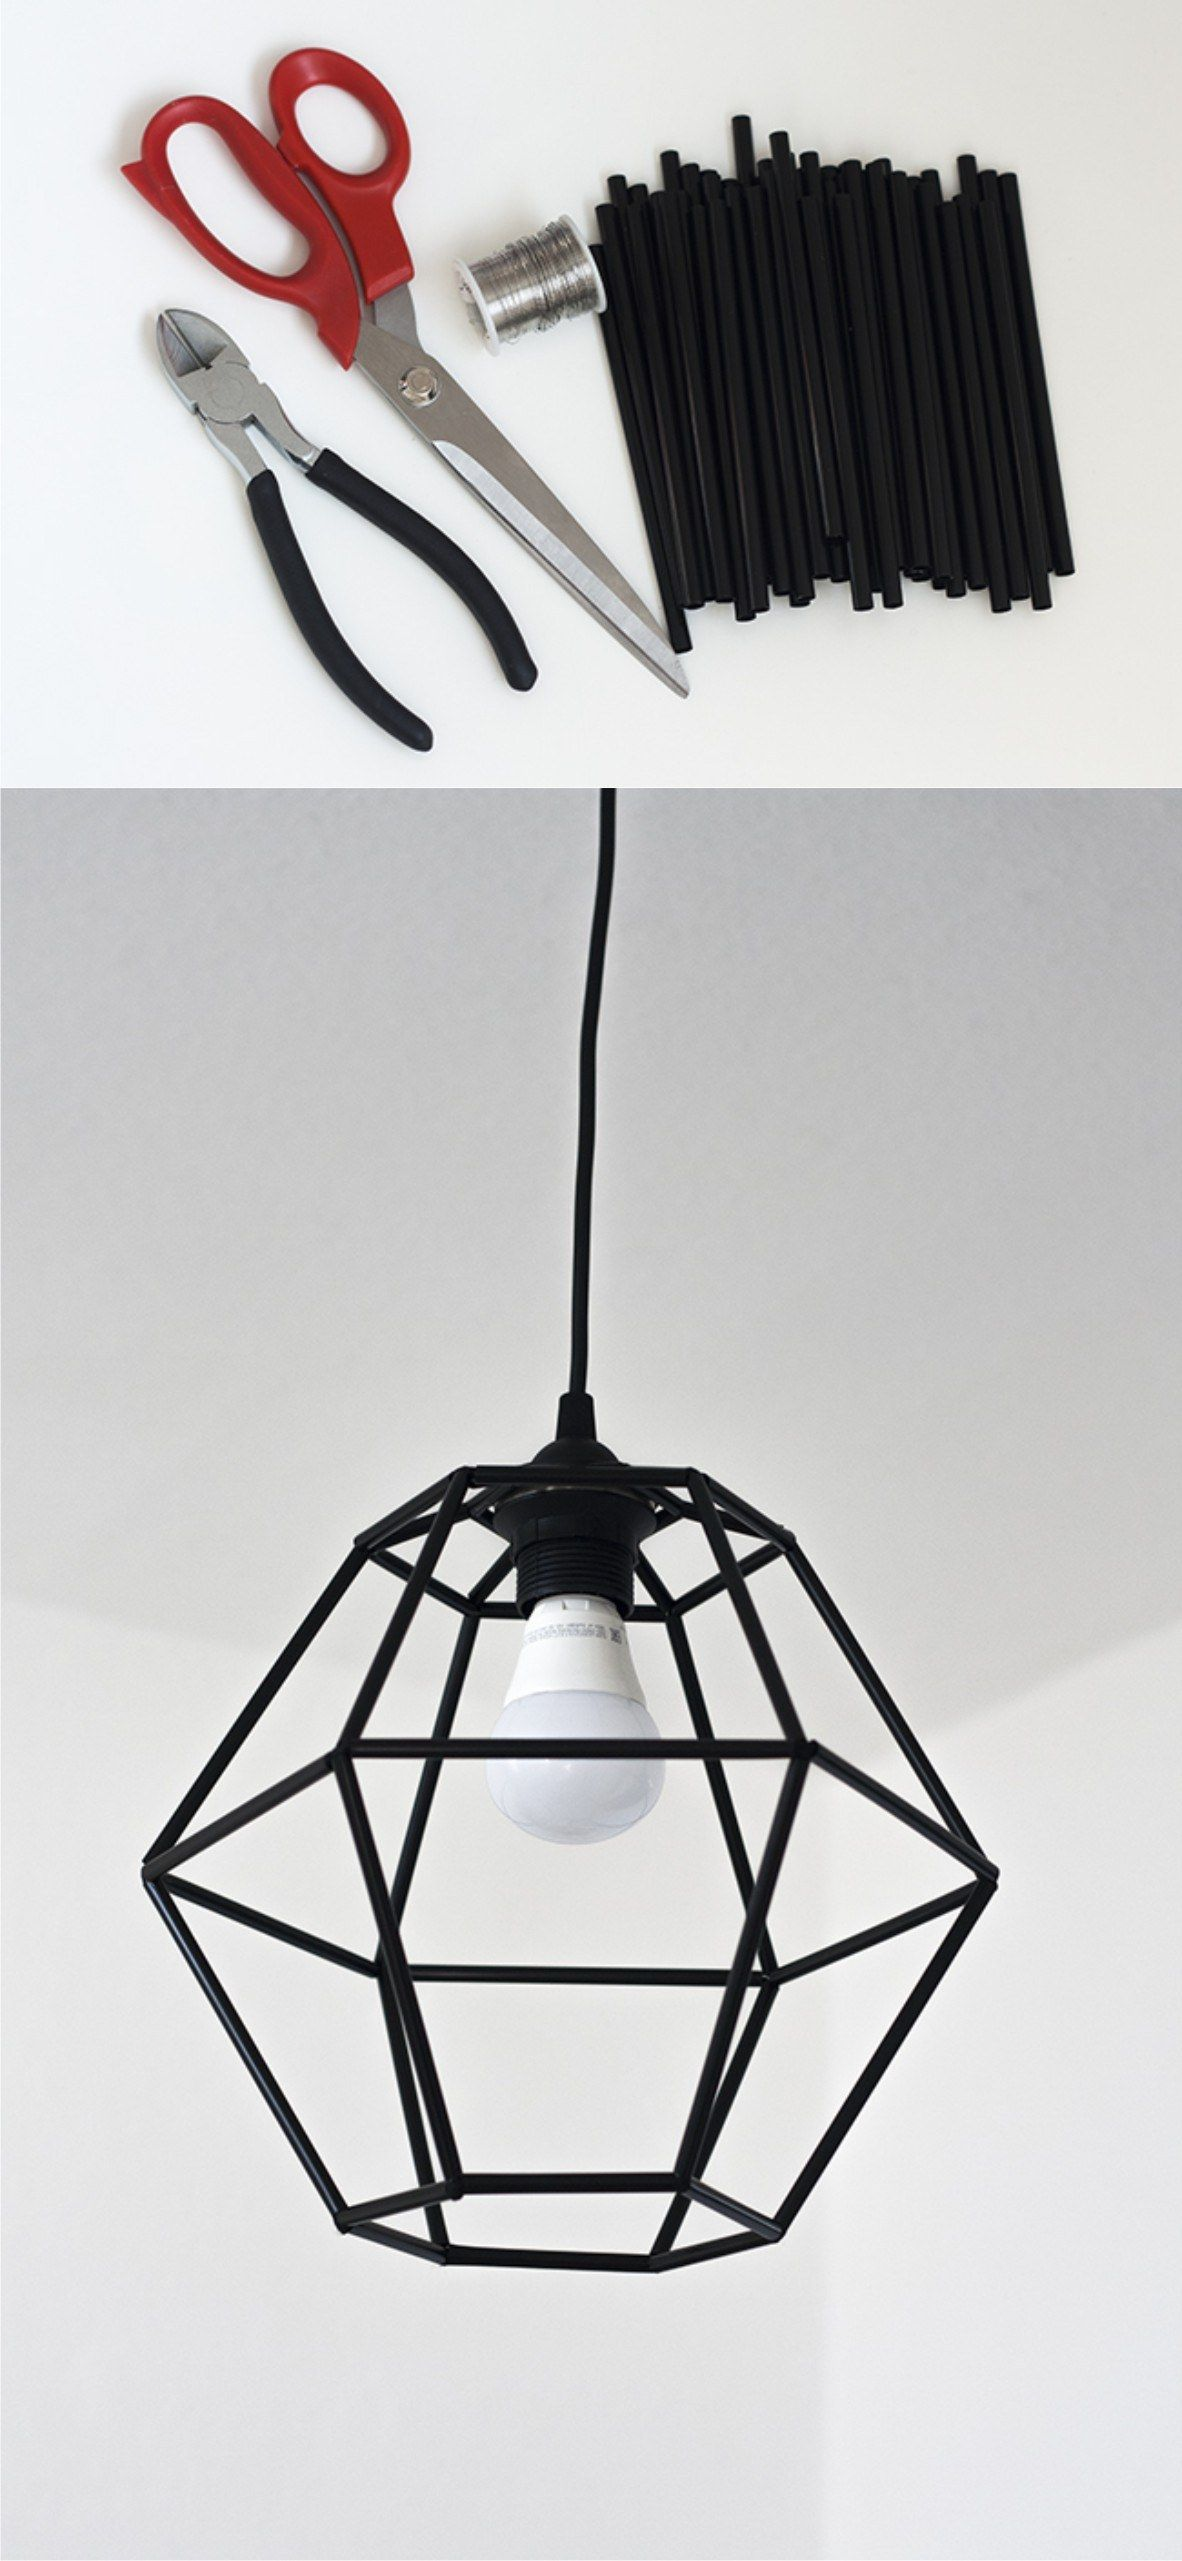 Make a trendy geometric pendant light fixture for under $10! | DIY ... for Diy Geometric Lamp  56bof